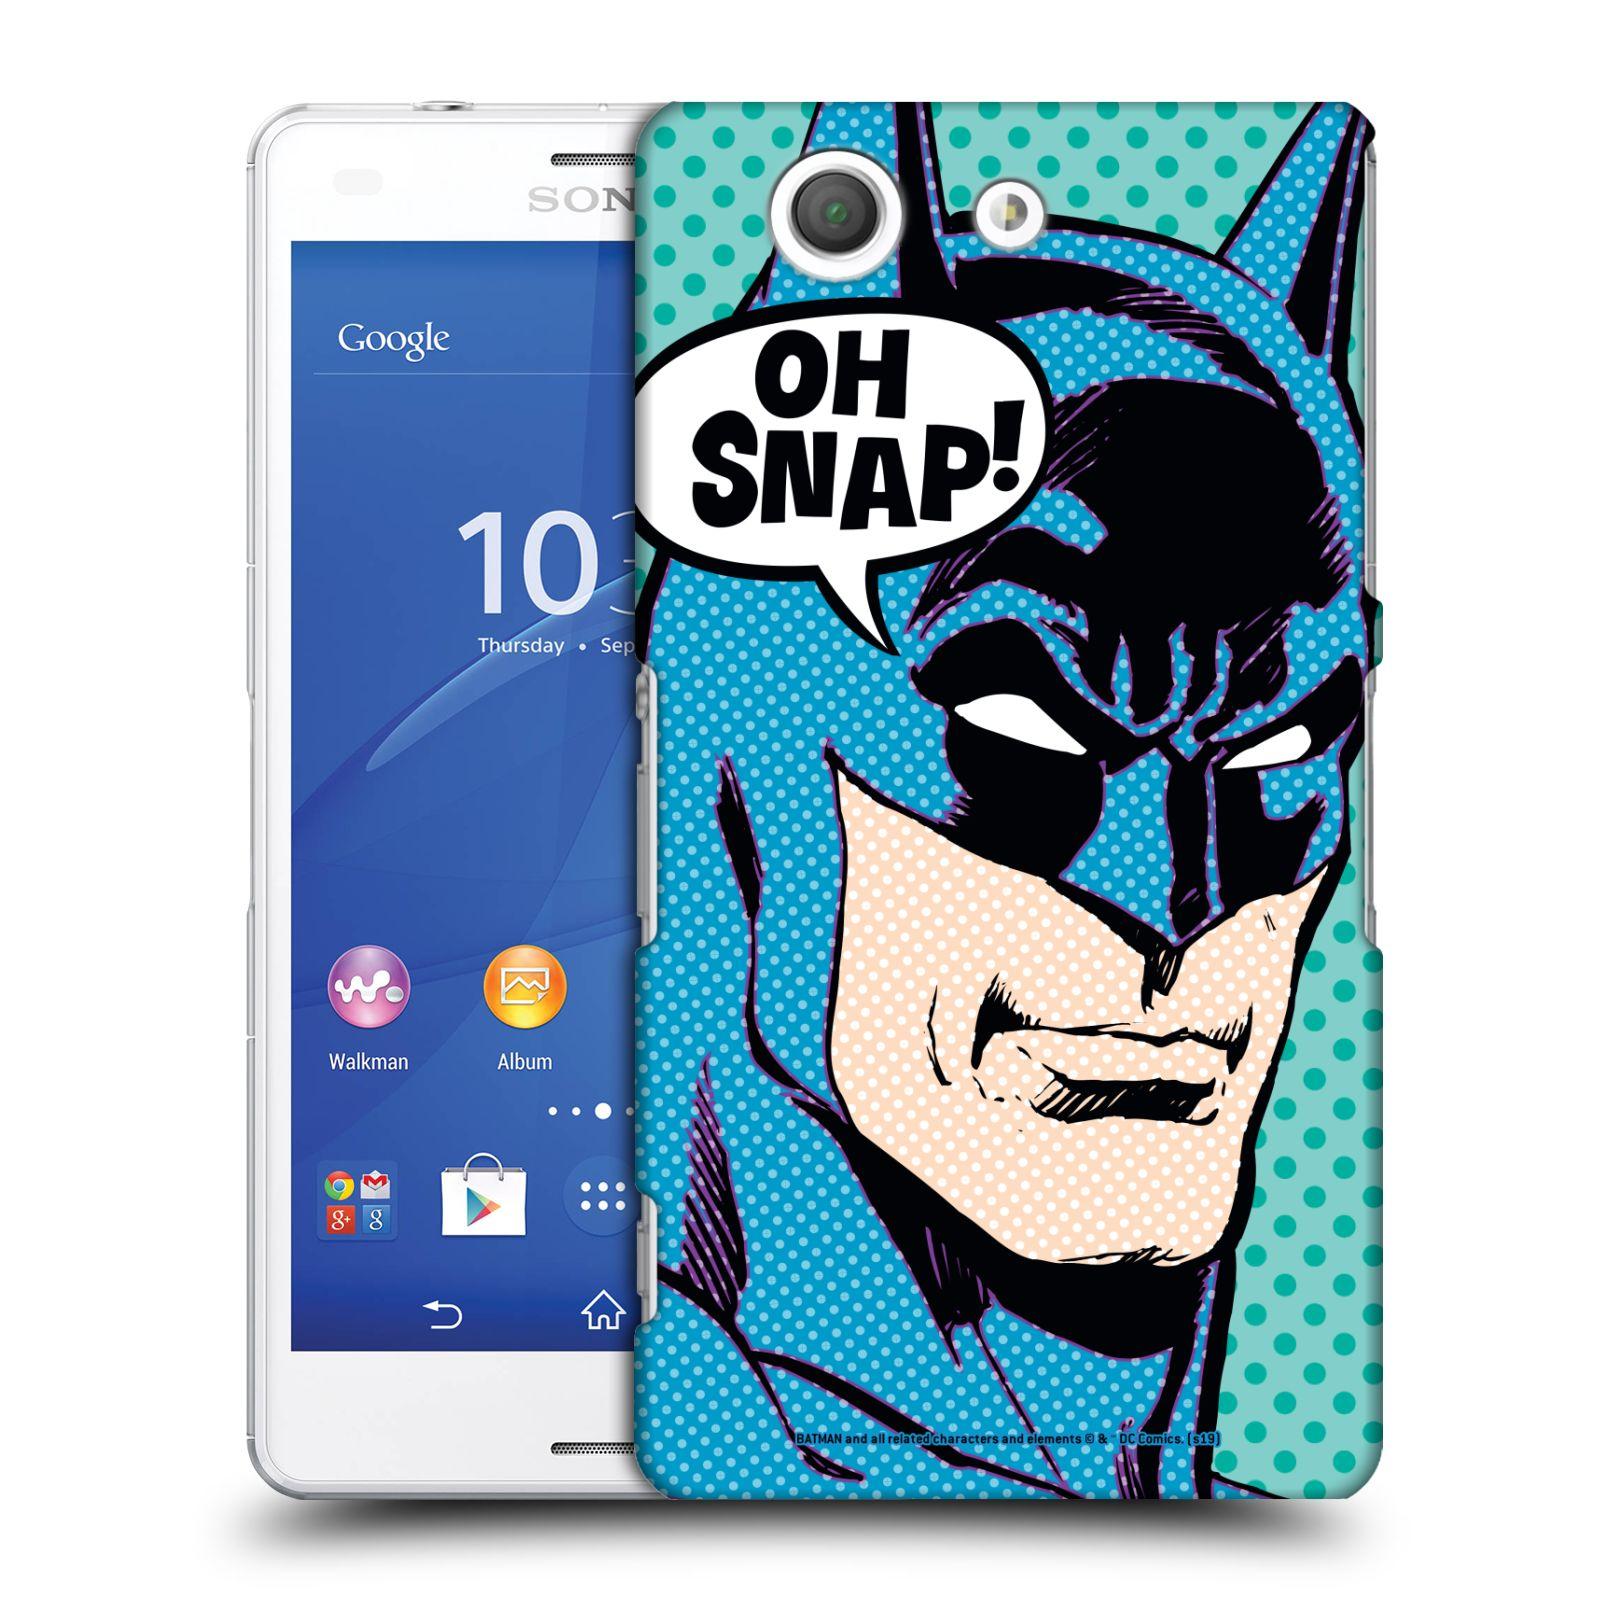 Pouzdro na mobil Sony Xperia Z3 COMPACT - HEAD CASE - DC komix Batman Pop Art tvář